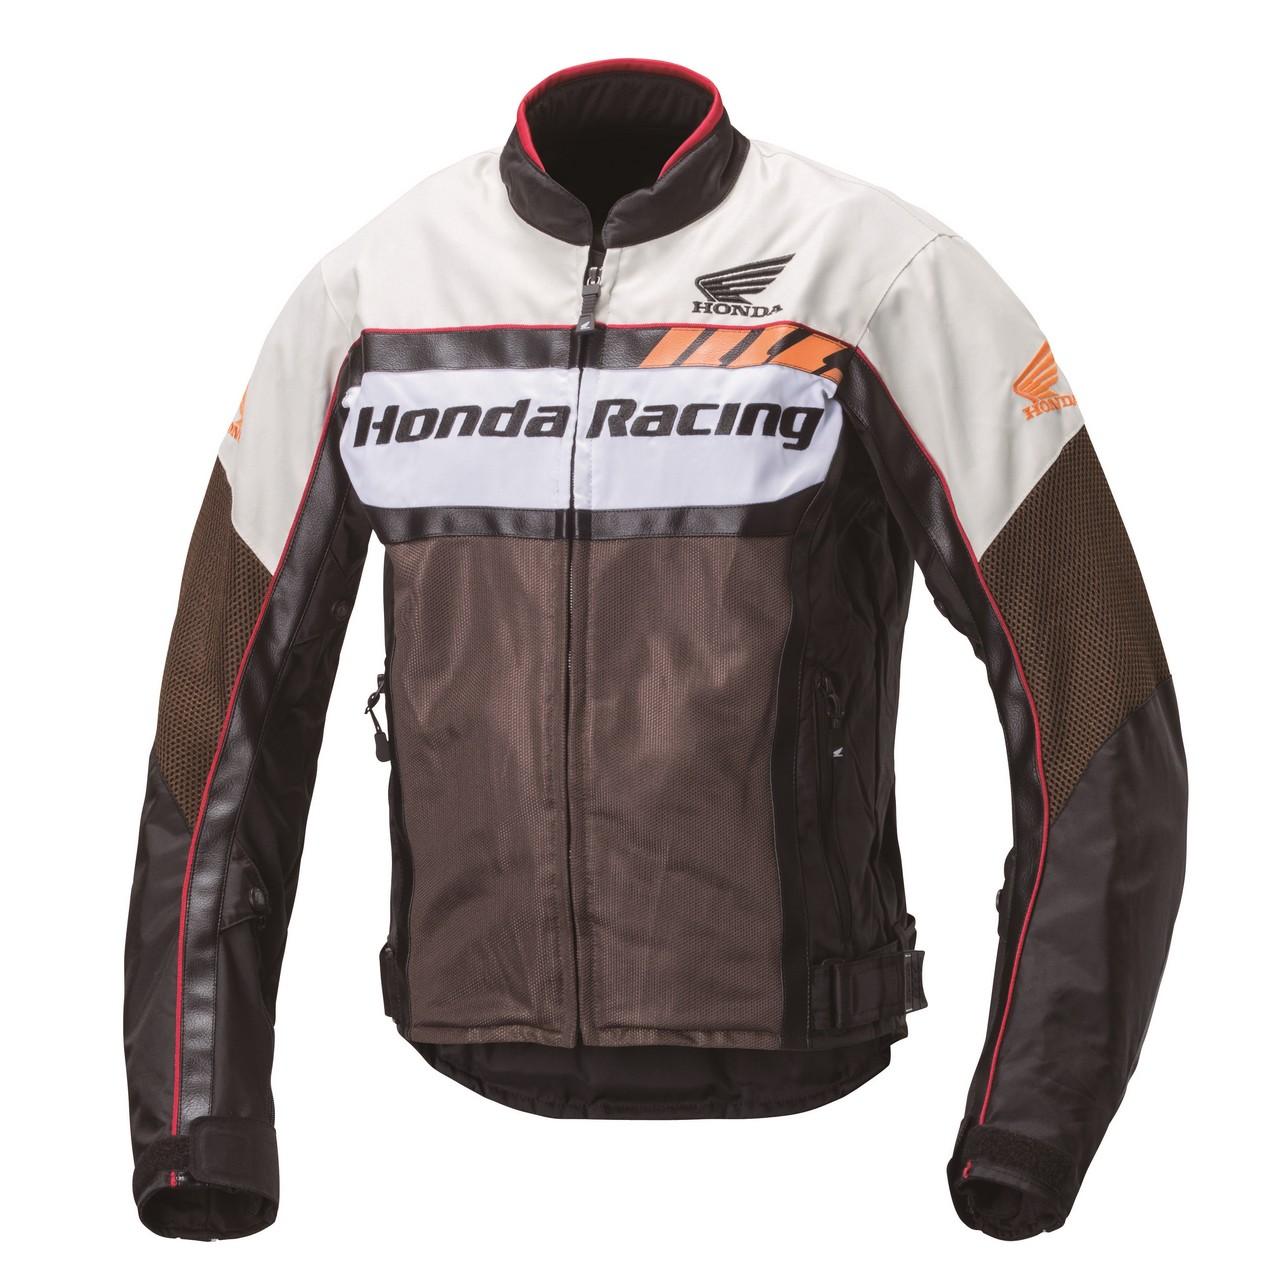 Honda Motorcycle Riding Gear